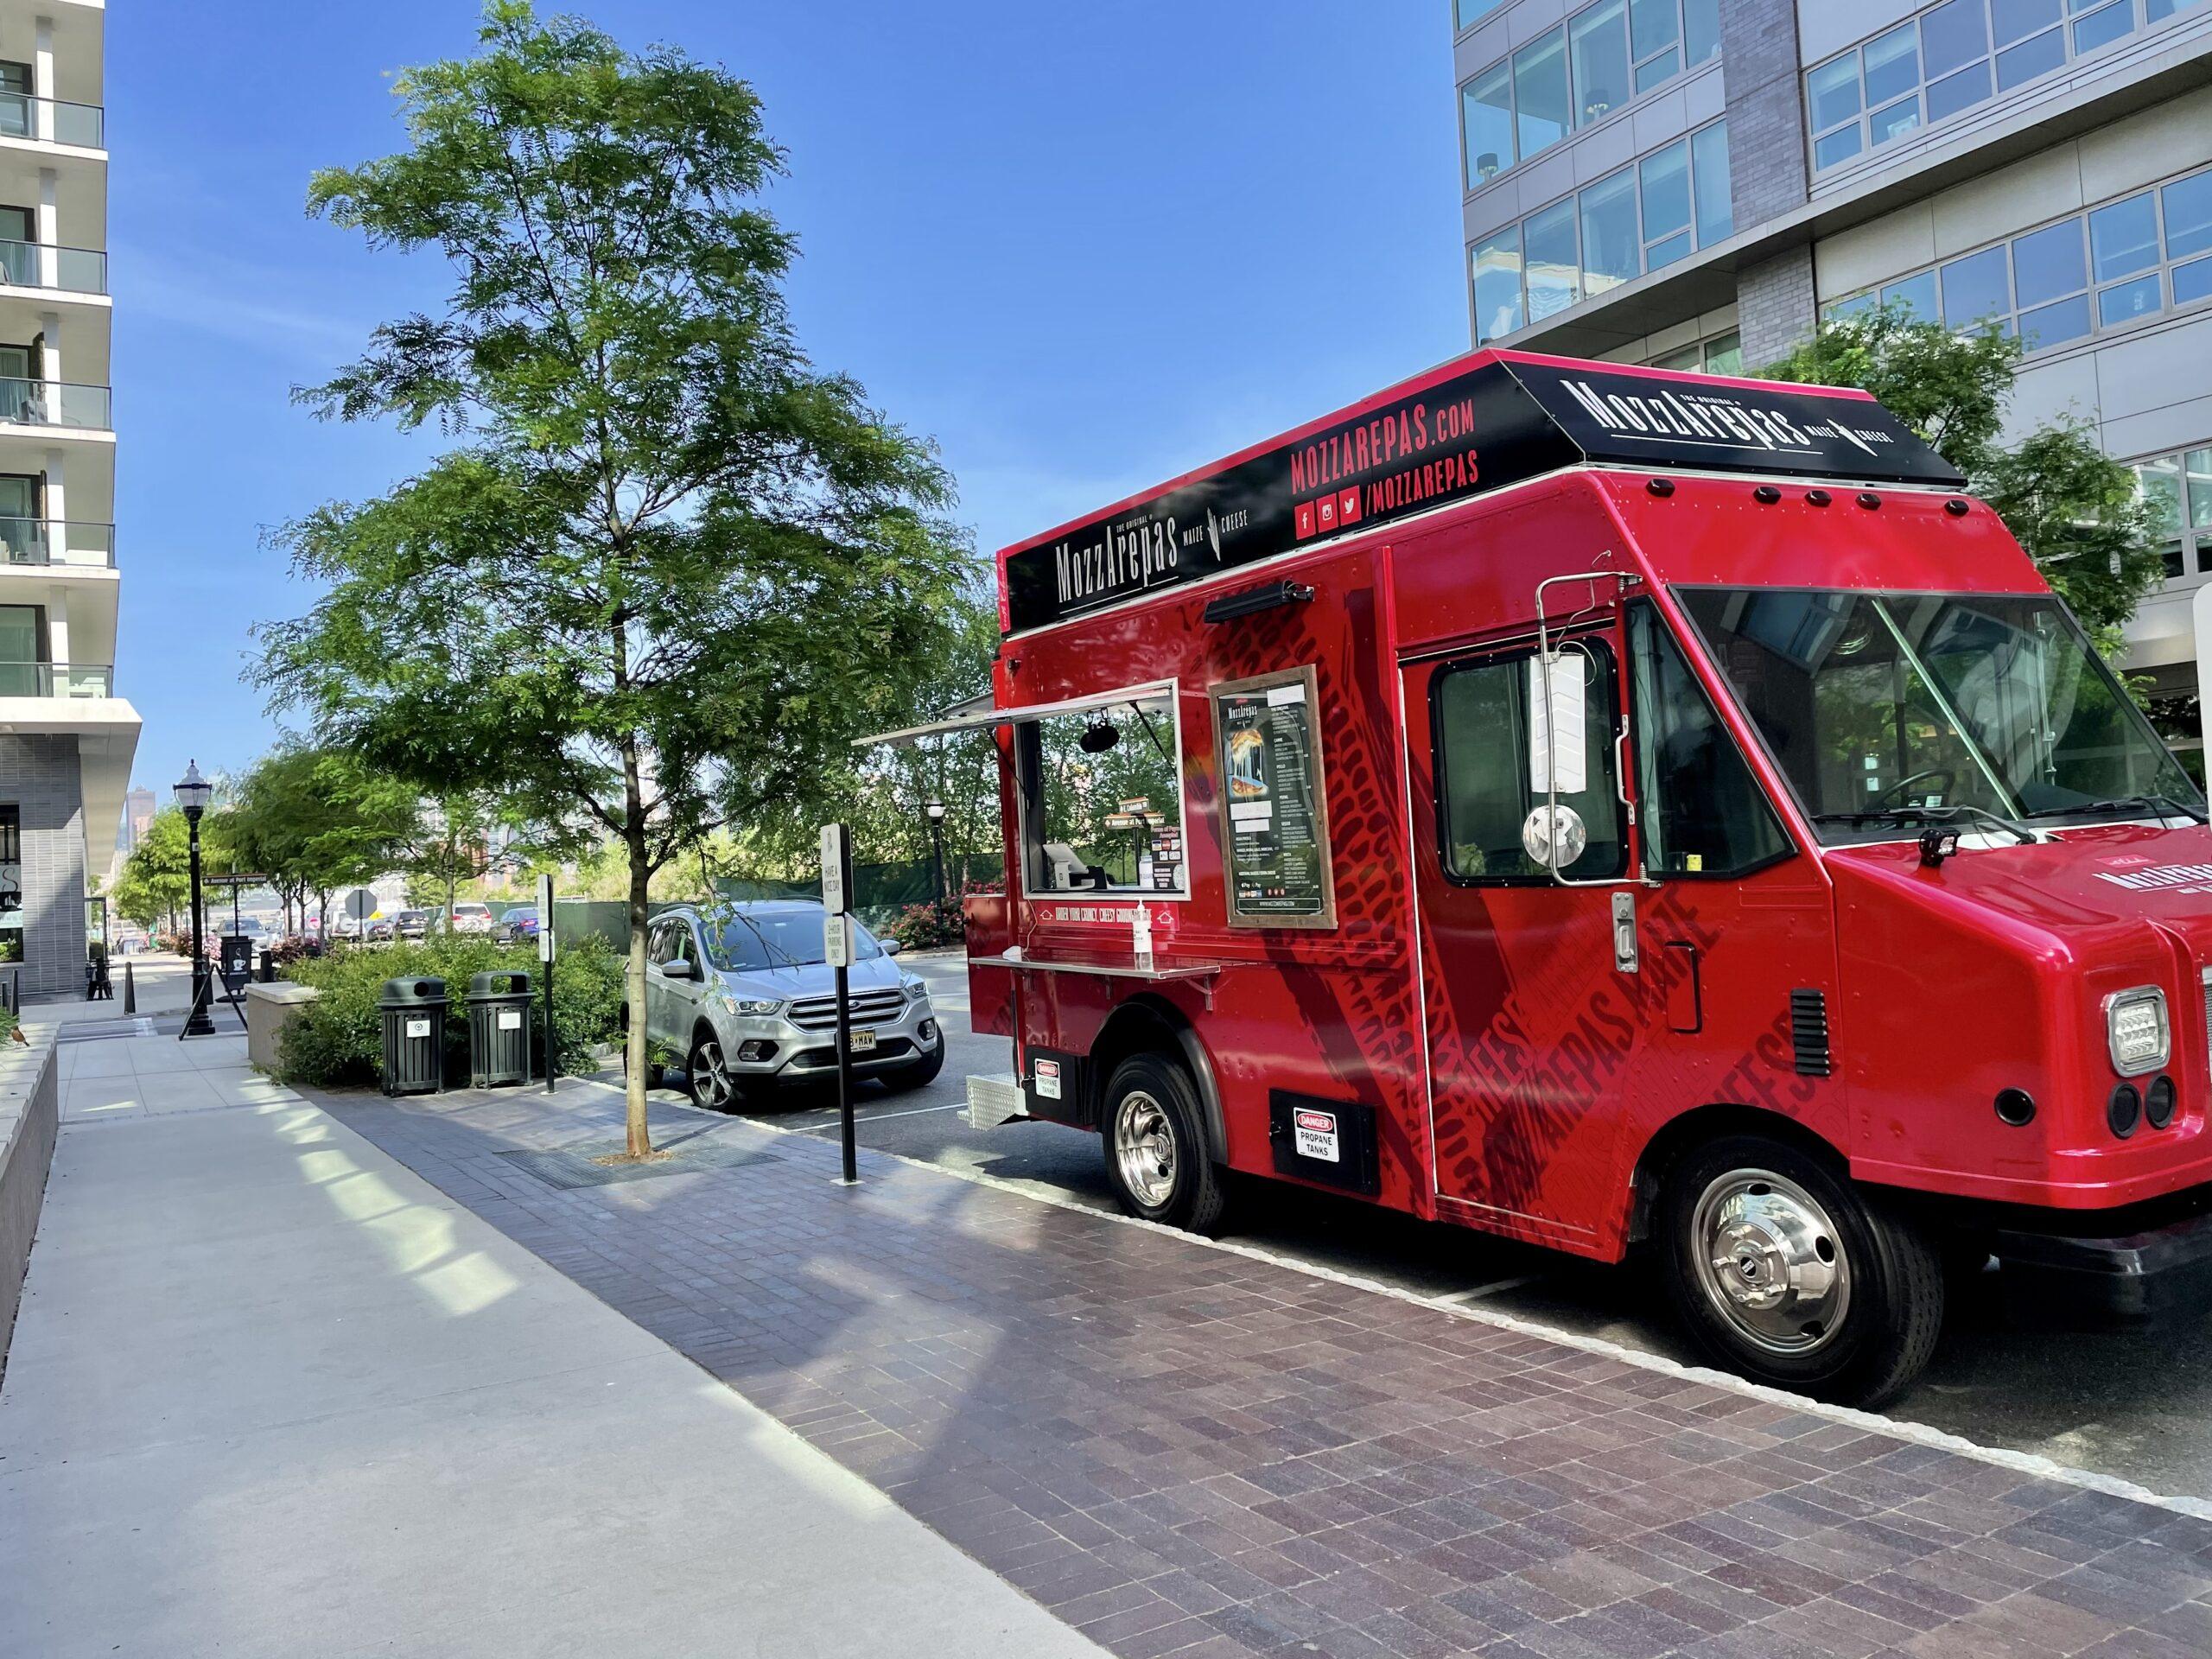 MozzArepas food truck catering nyc